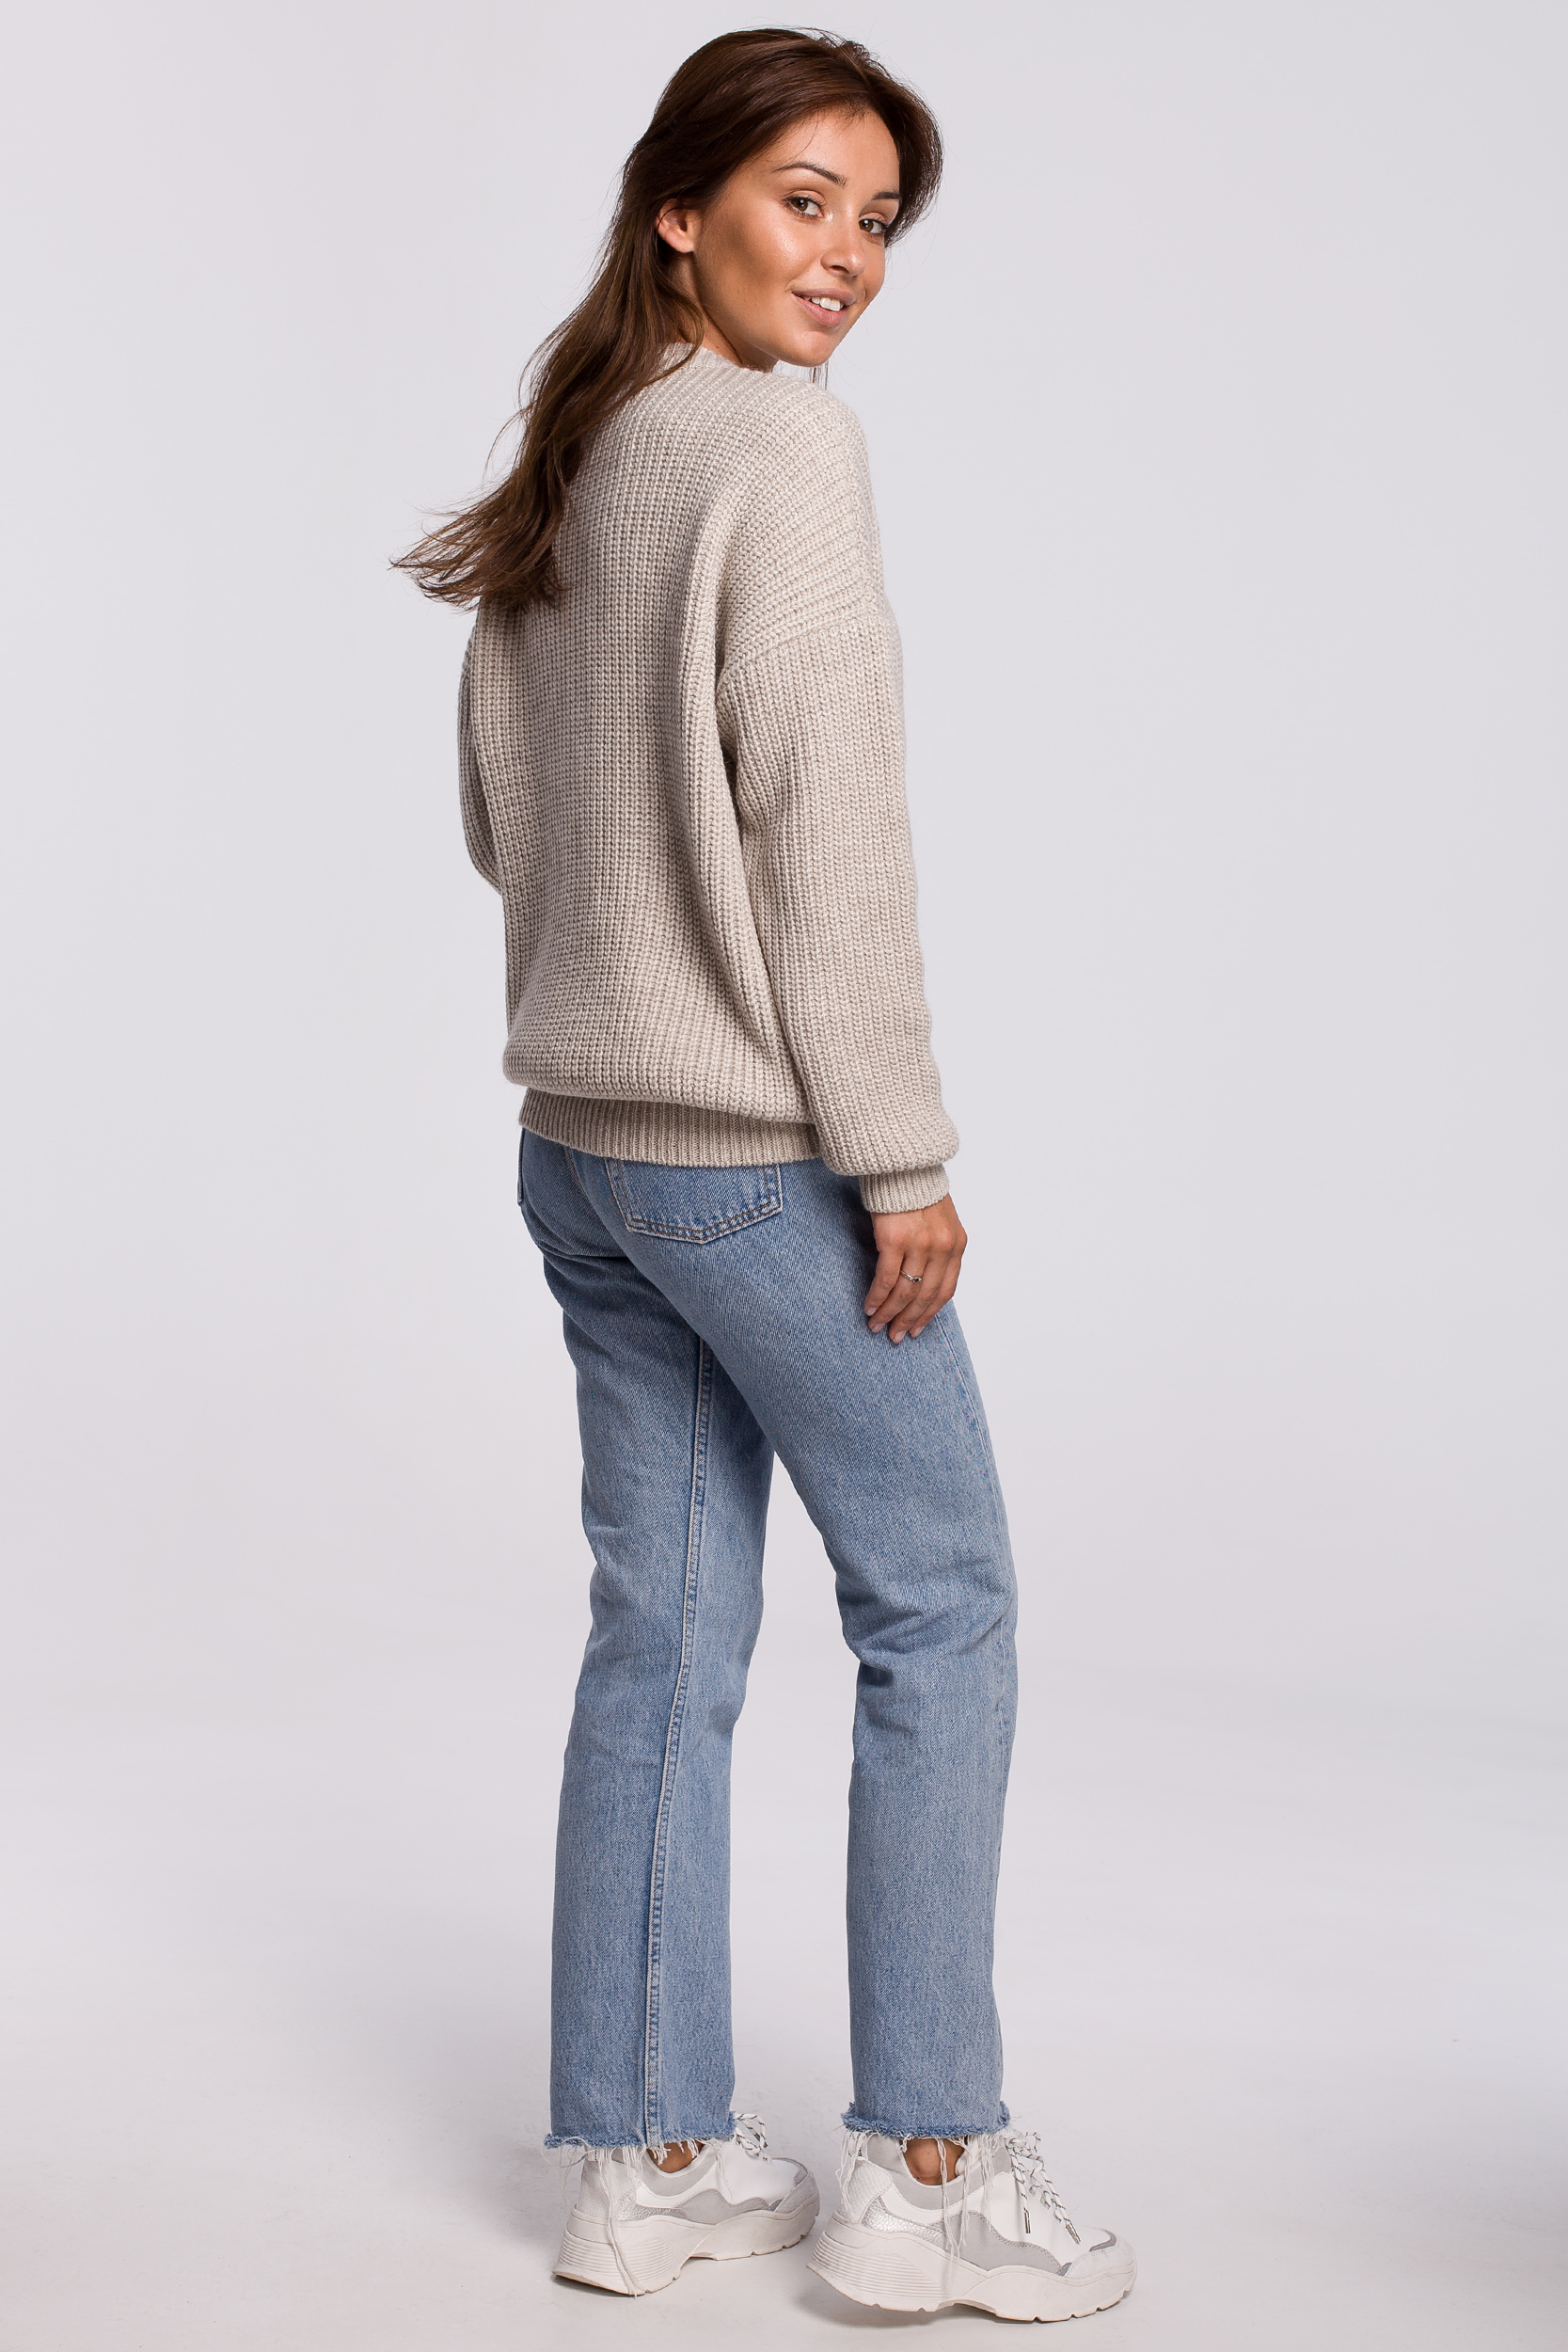 Sweater in Beige Rückansicht komplett